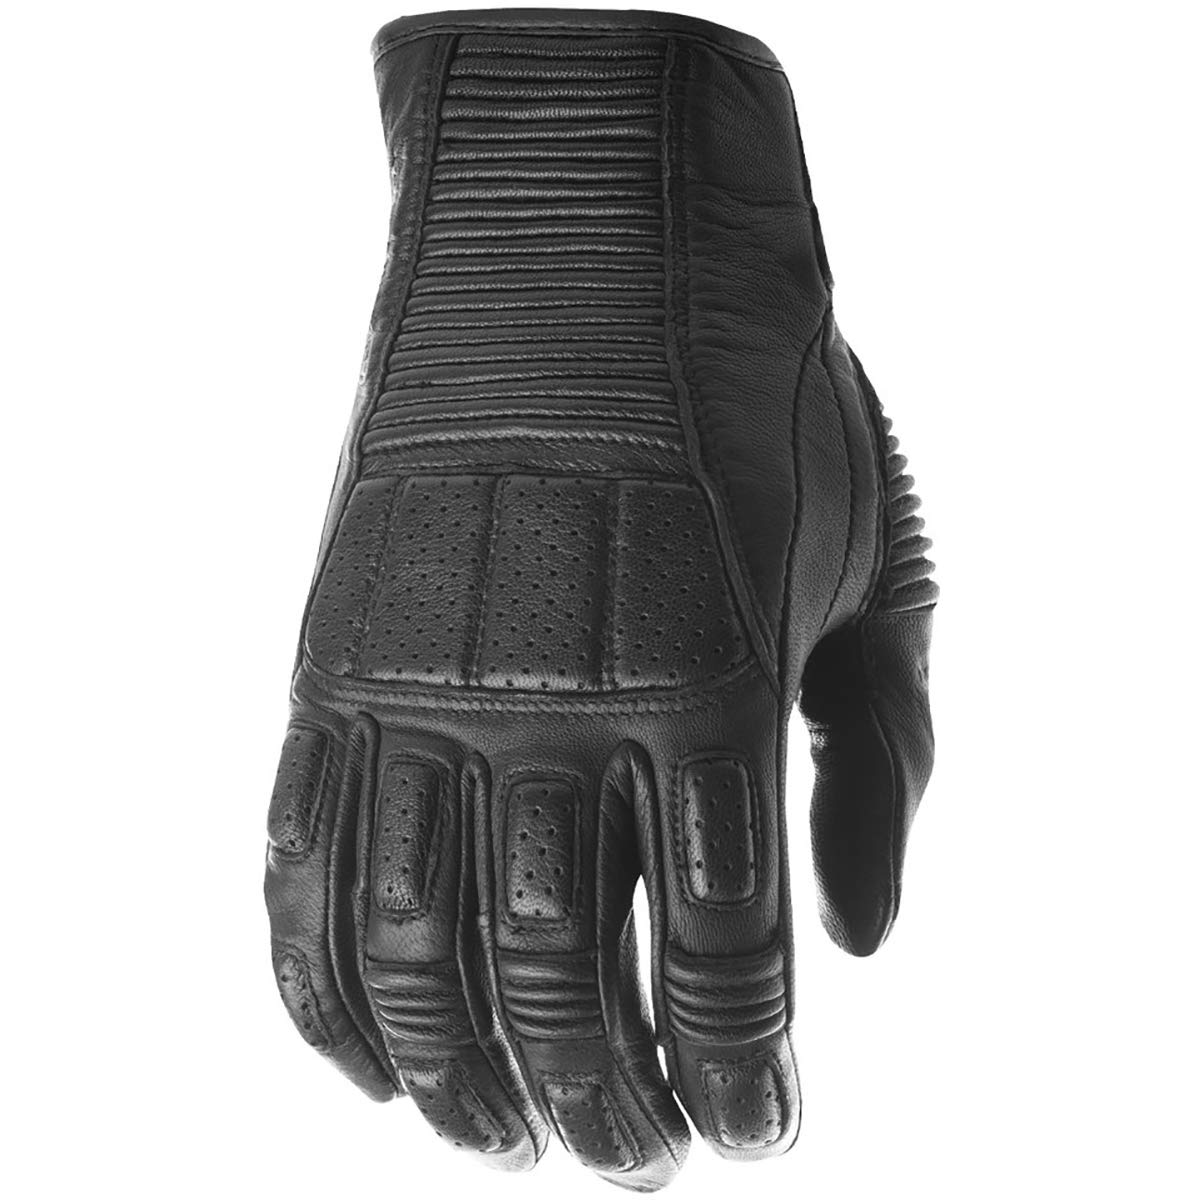 Black//Large Highway 21 Trigger Mens Street Motorcycle Gloves